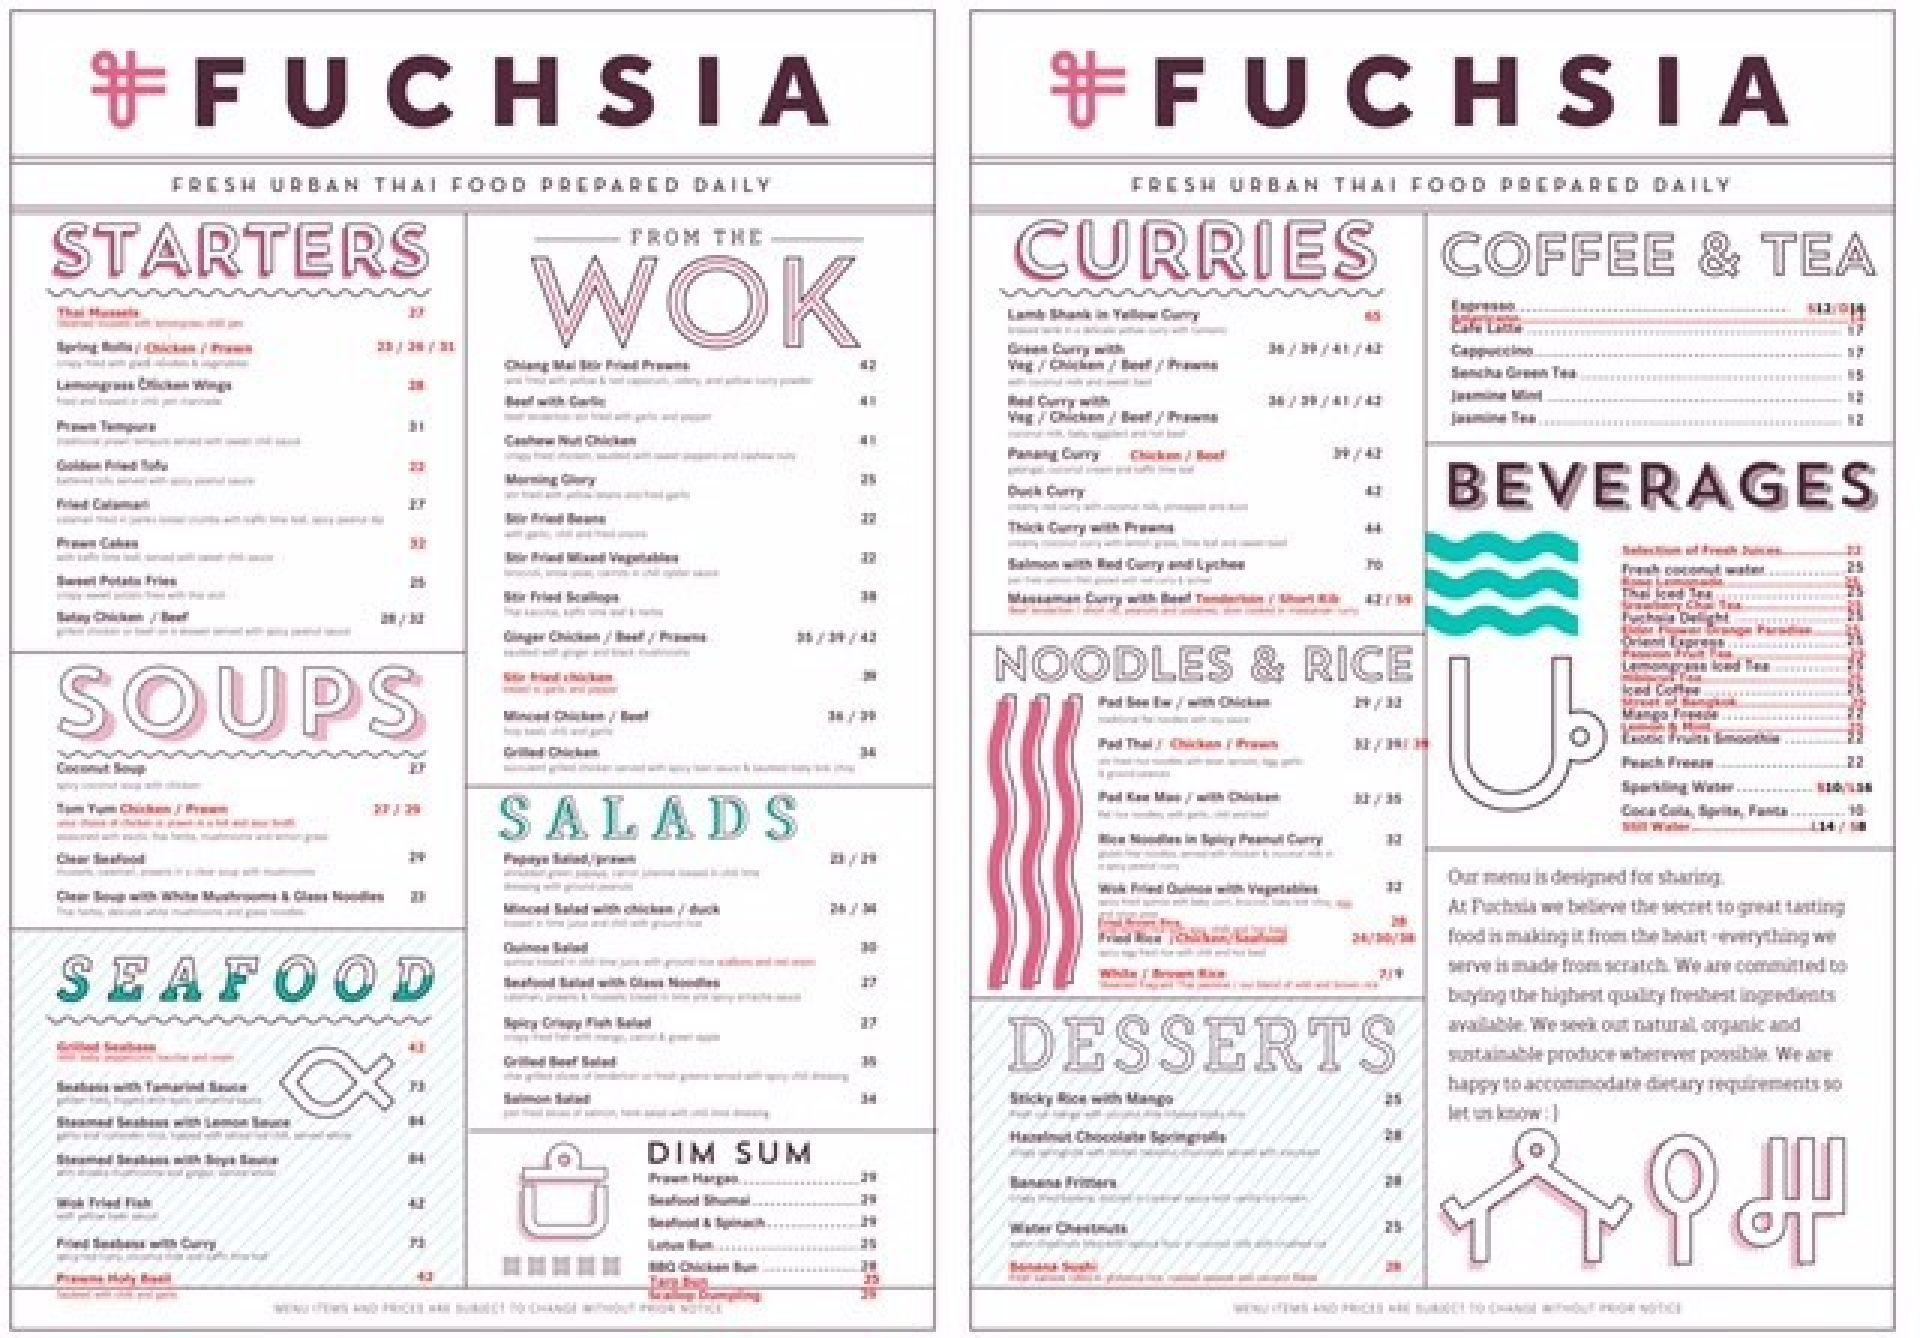 Menu of the Fuchsia